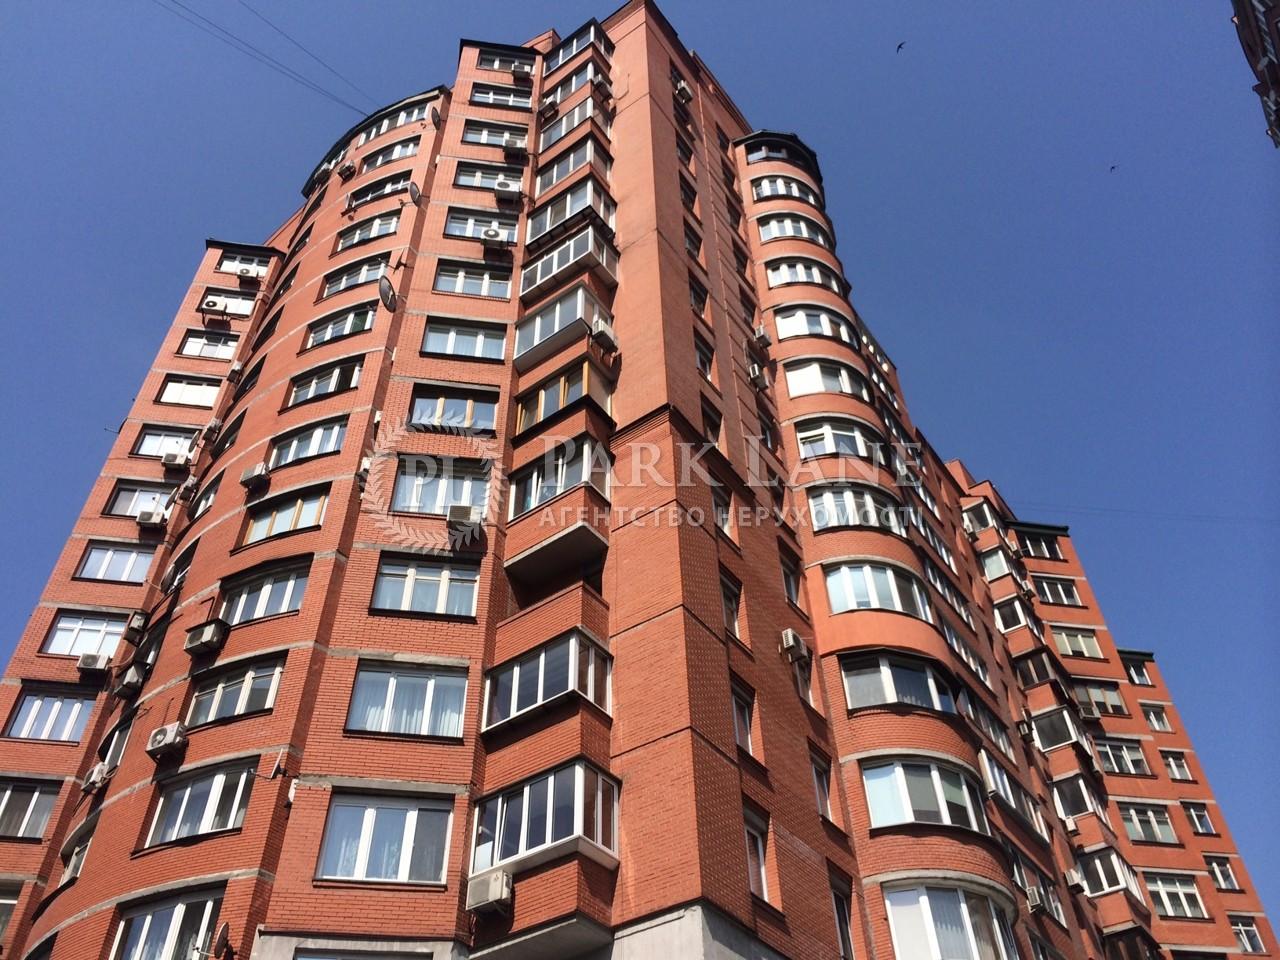 Квартира ул. Златоустовская, 10/12, Киев, Z-1417441 - Фото 2